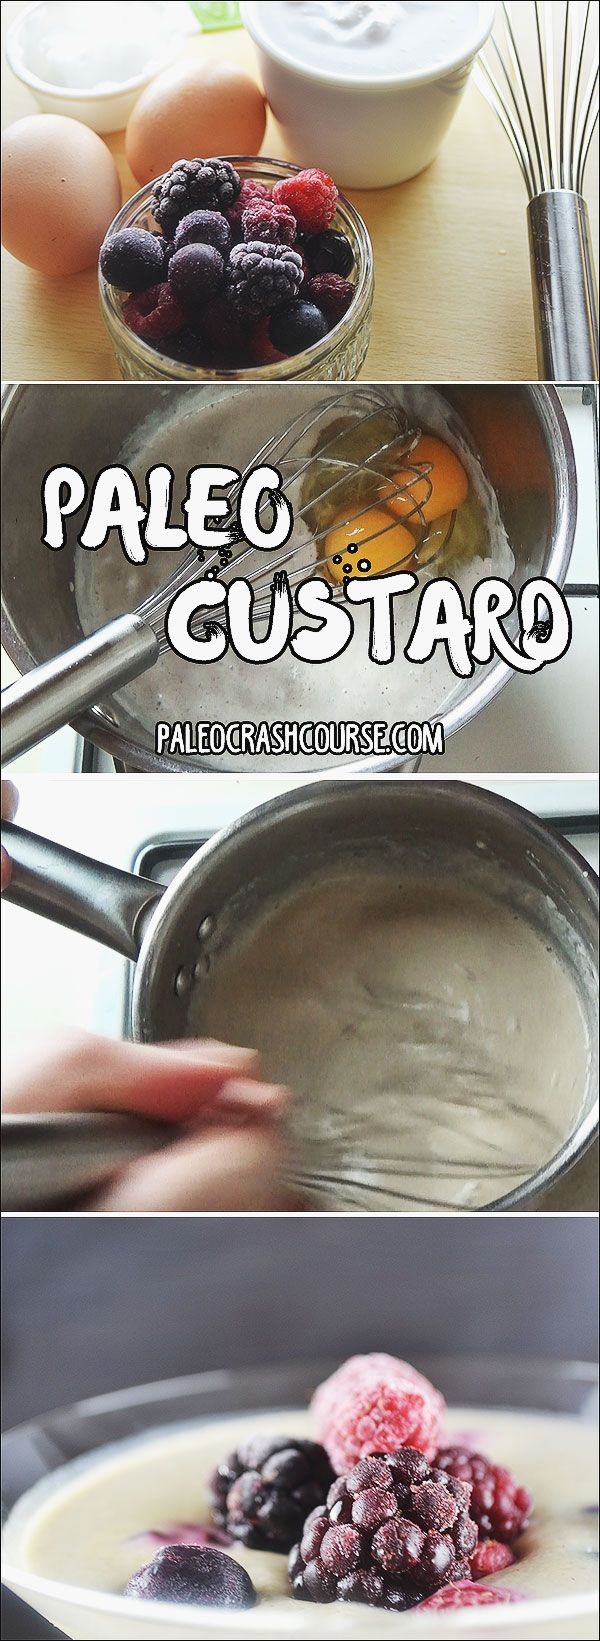 A yummy paleo custard recipe that makes for a great dessert or even breakfast!   http://paleocrashcourse.com/paleo-custard/